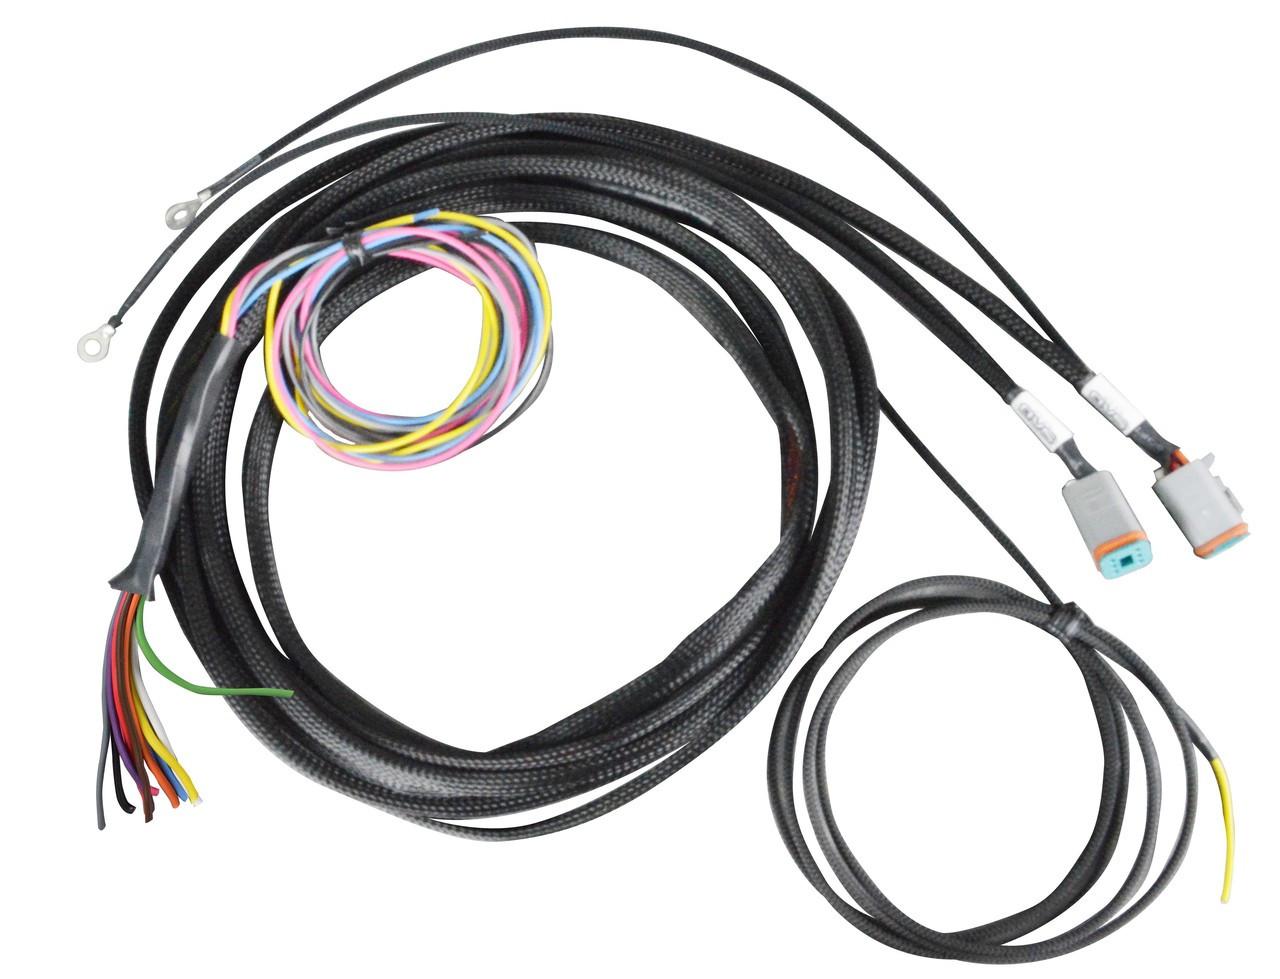 avs valve wiring harness 12 17 22 accuair endo  [ 1280 x 979 Pixel ]